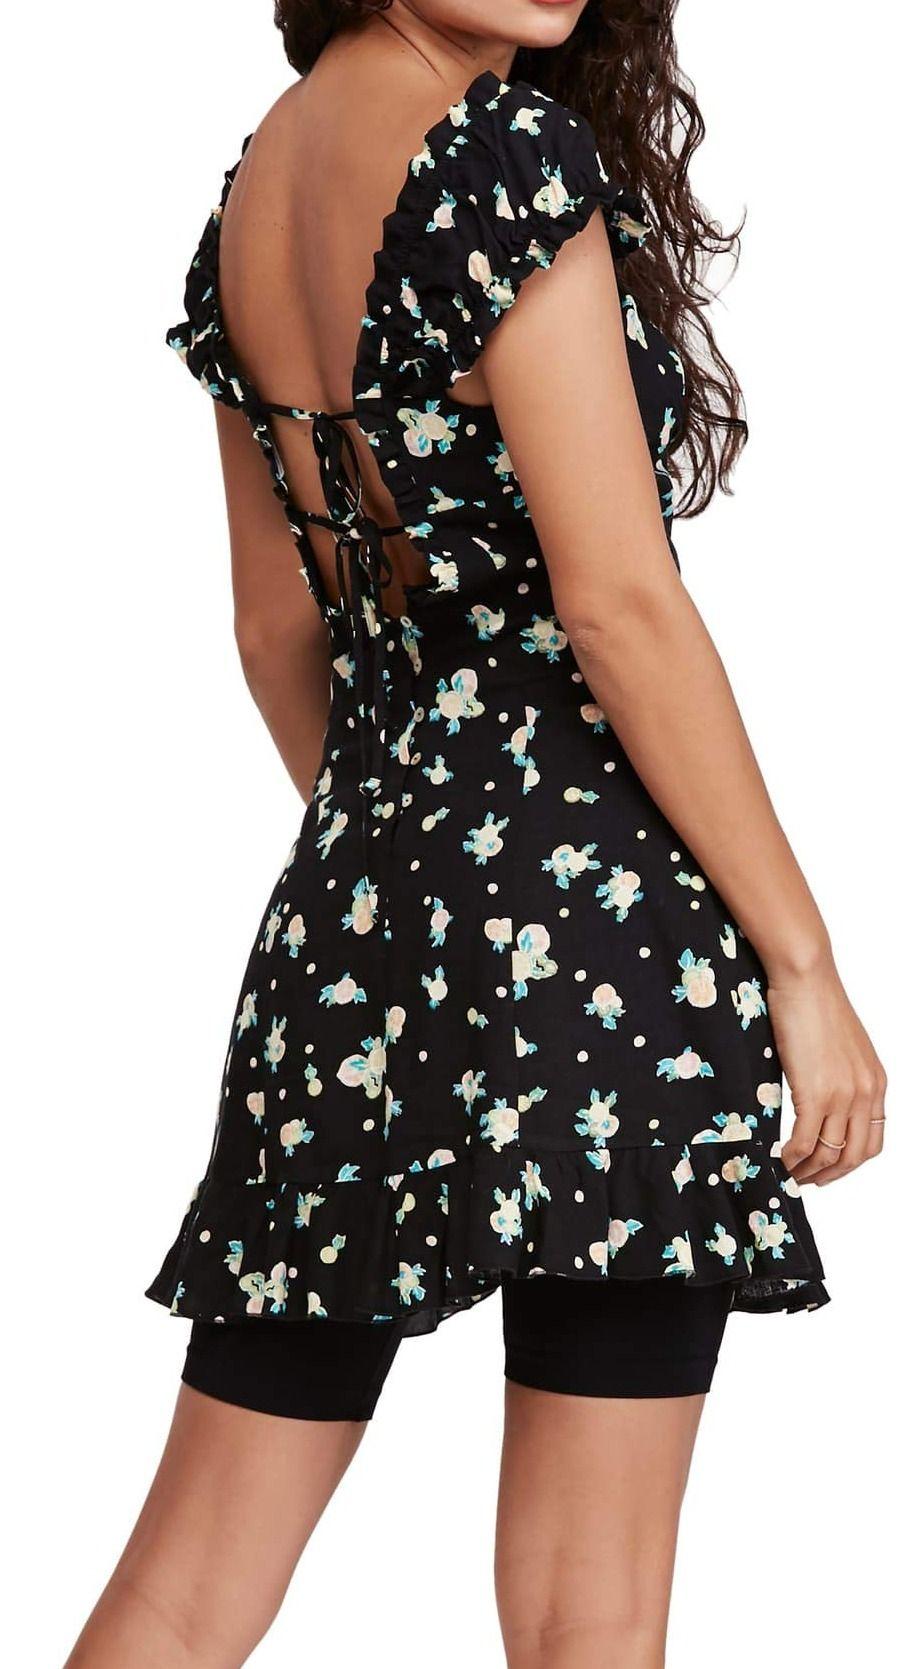 Free People Women's Dress Black Size Medium M A-Line Fruit Print Mini